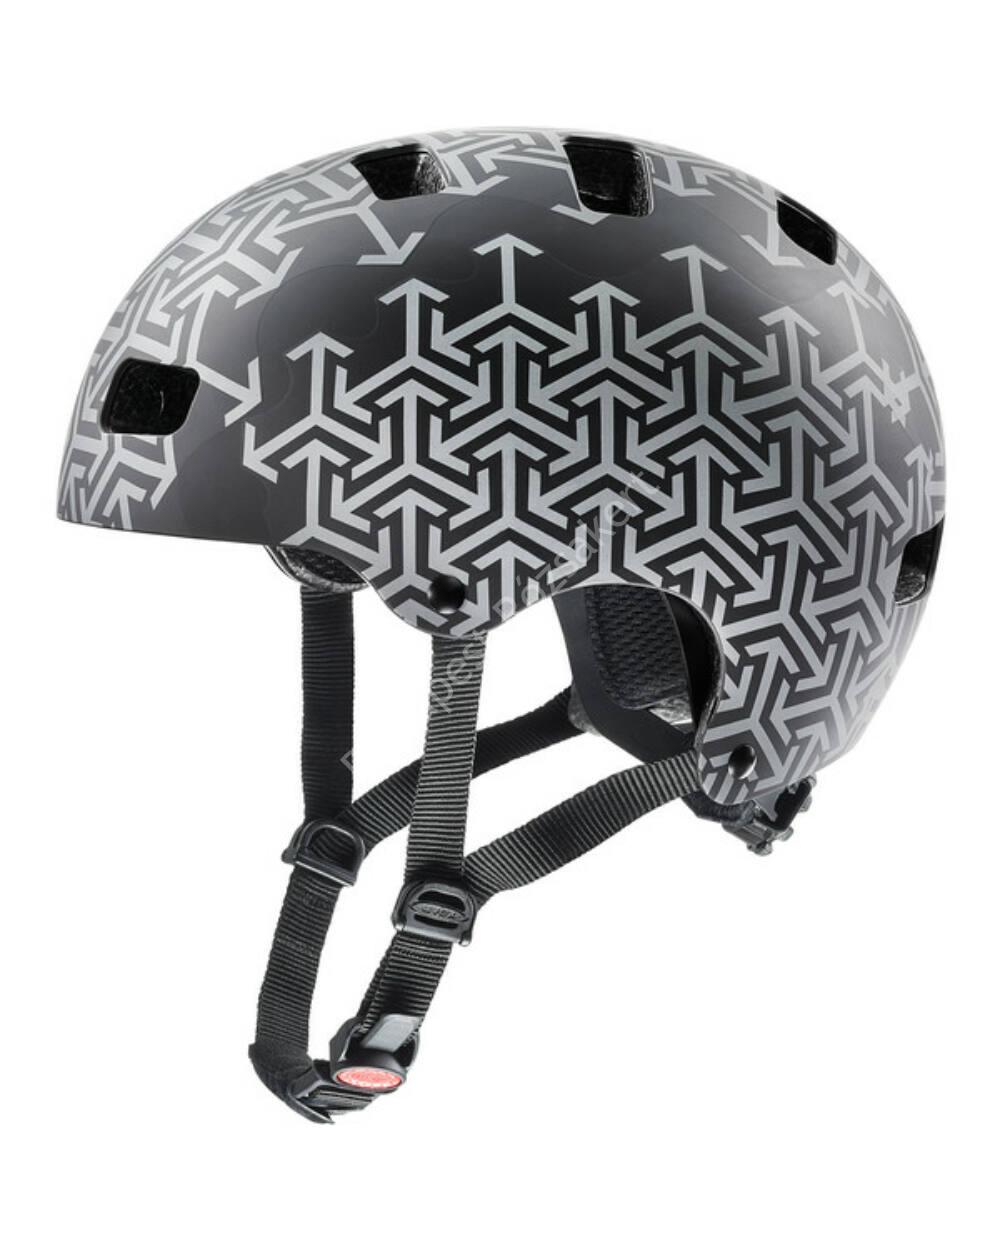 Uvex Kid 3 CC black-silver bukósisak, 51-55 cm